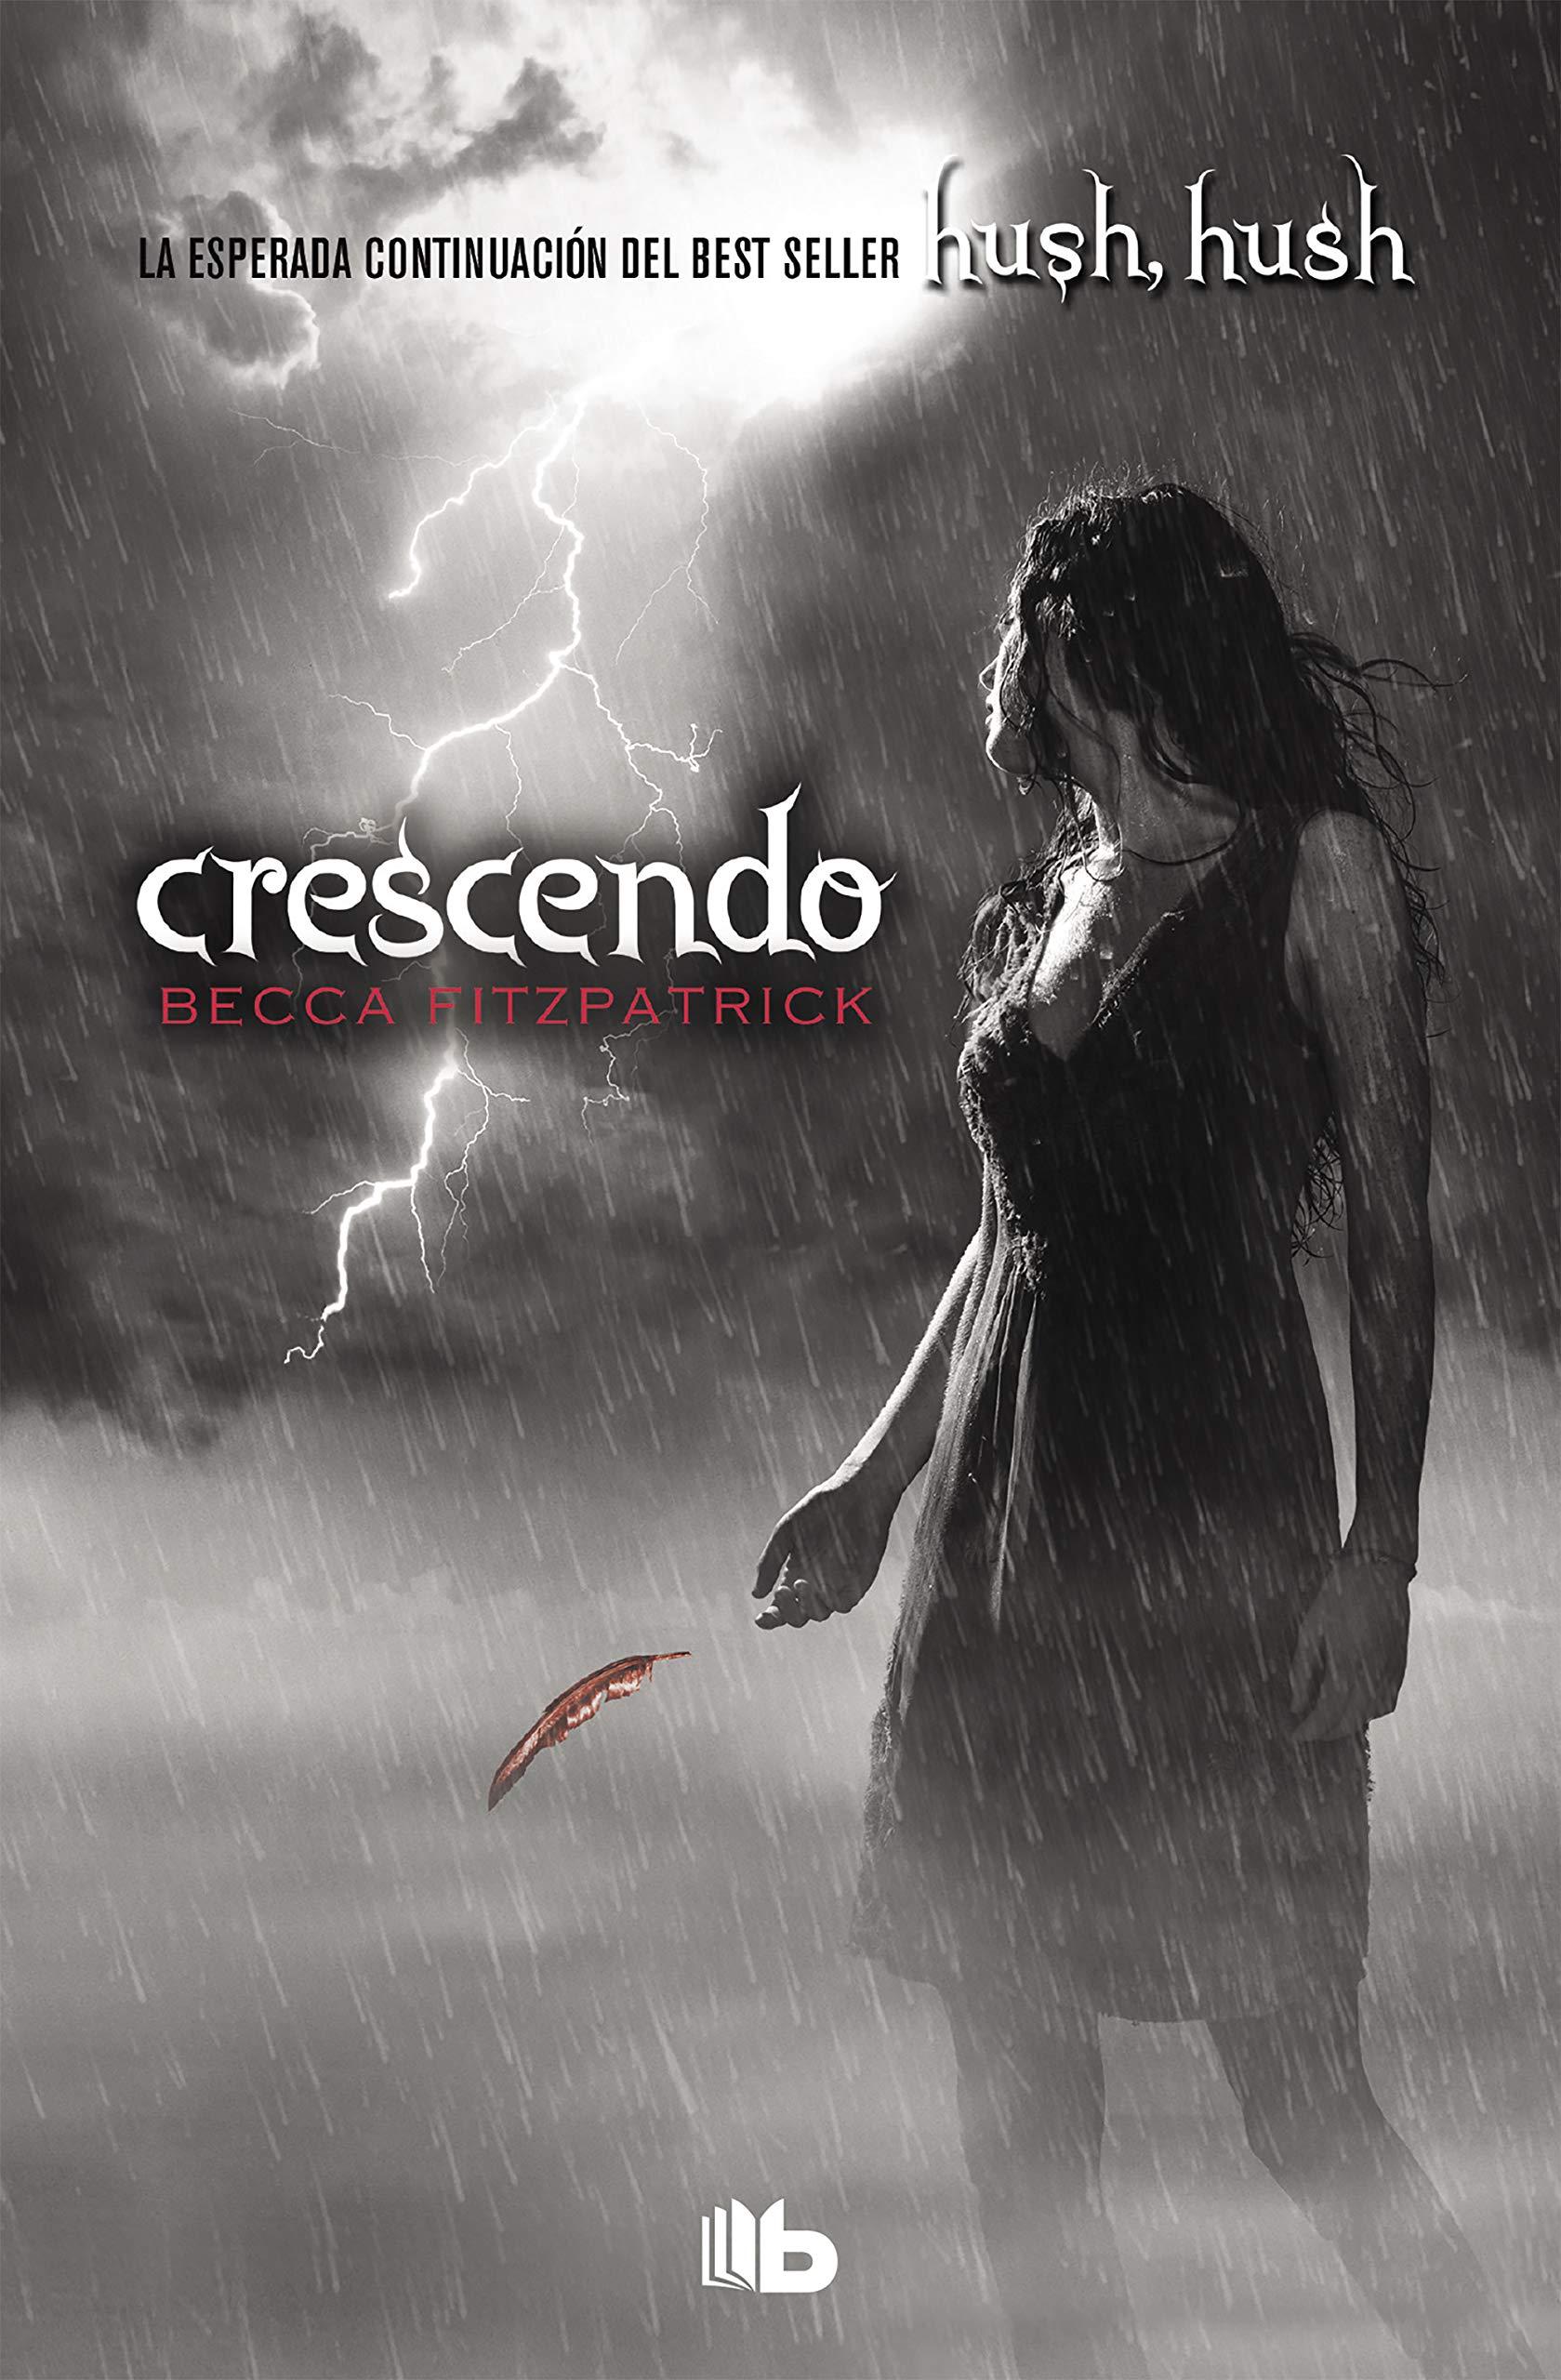 Crescendo (Saga Hush, Hush 2): Amazon.es: Fitzpatrick, Becca ...